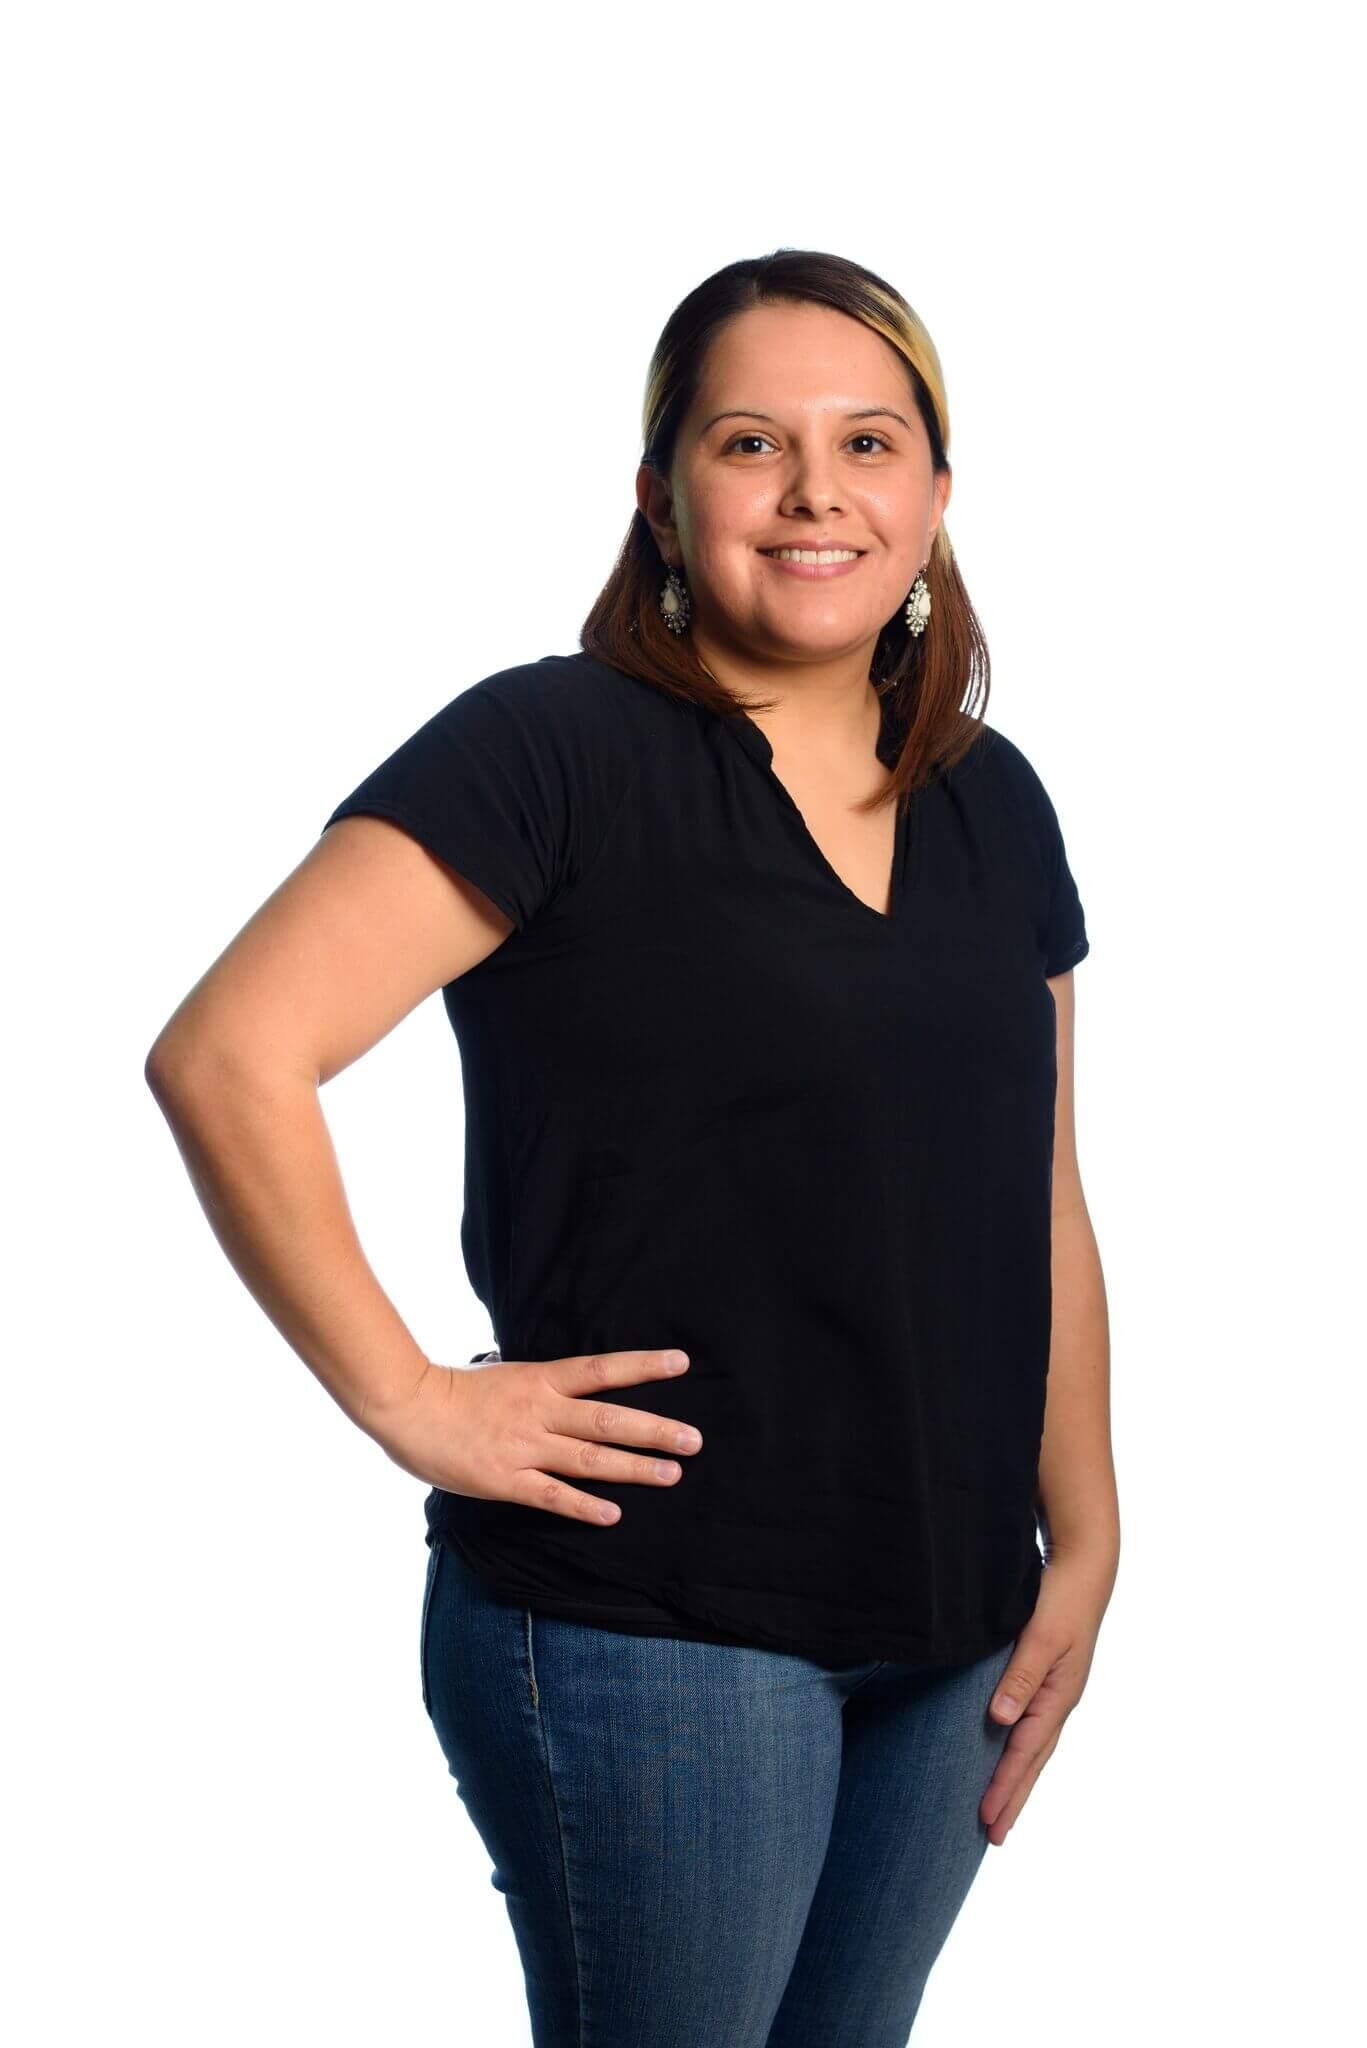 Janie Reyes – Patient Insurance Coordinator